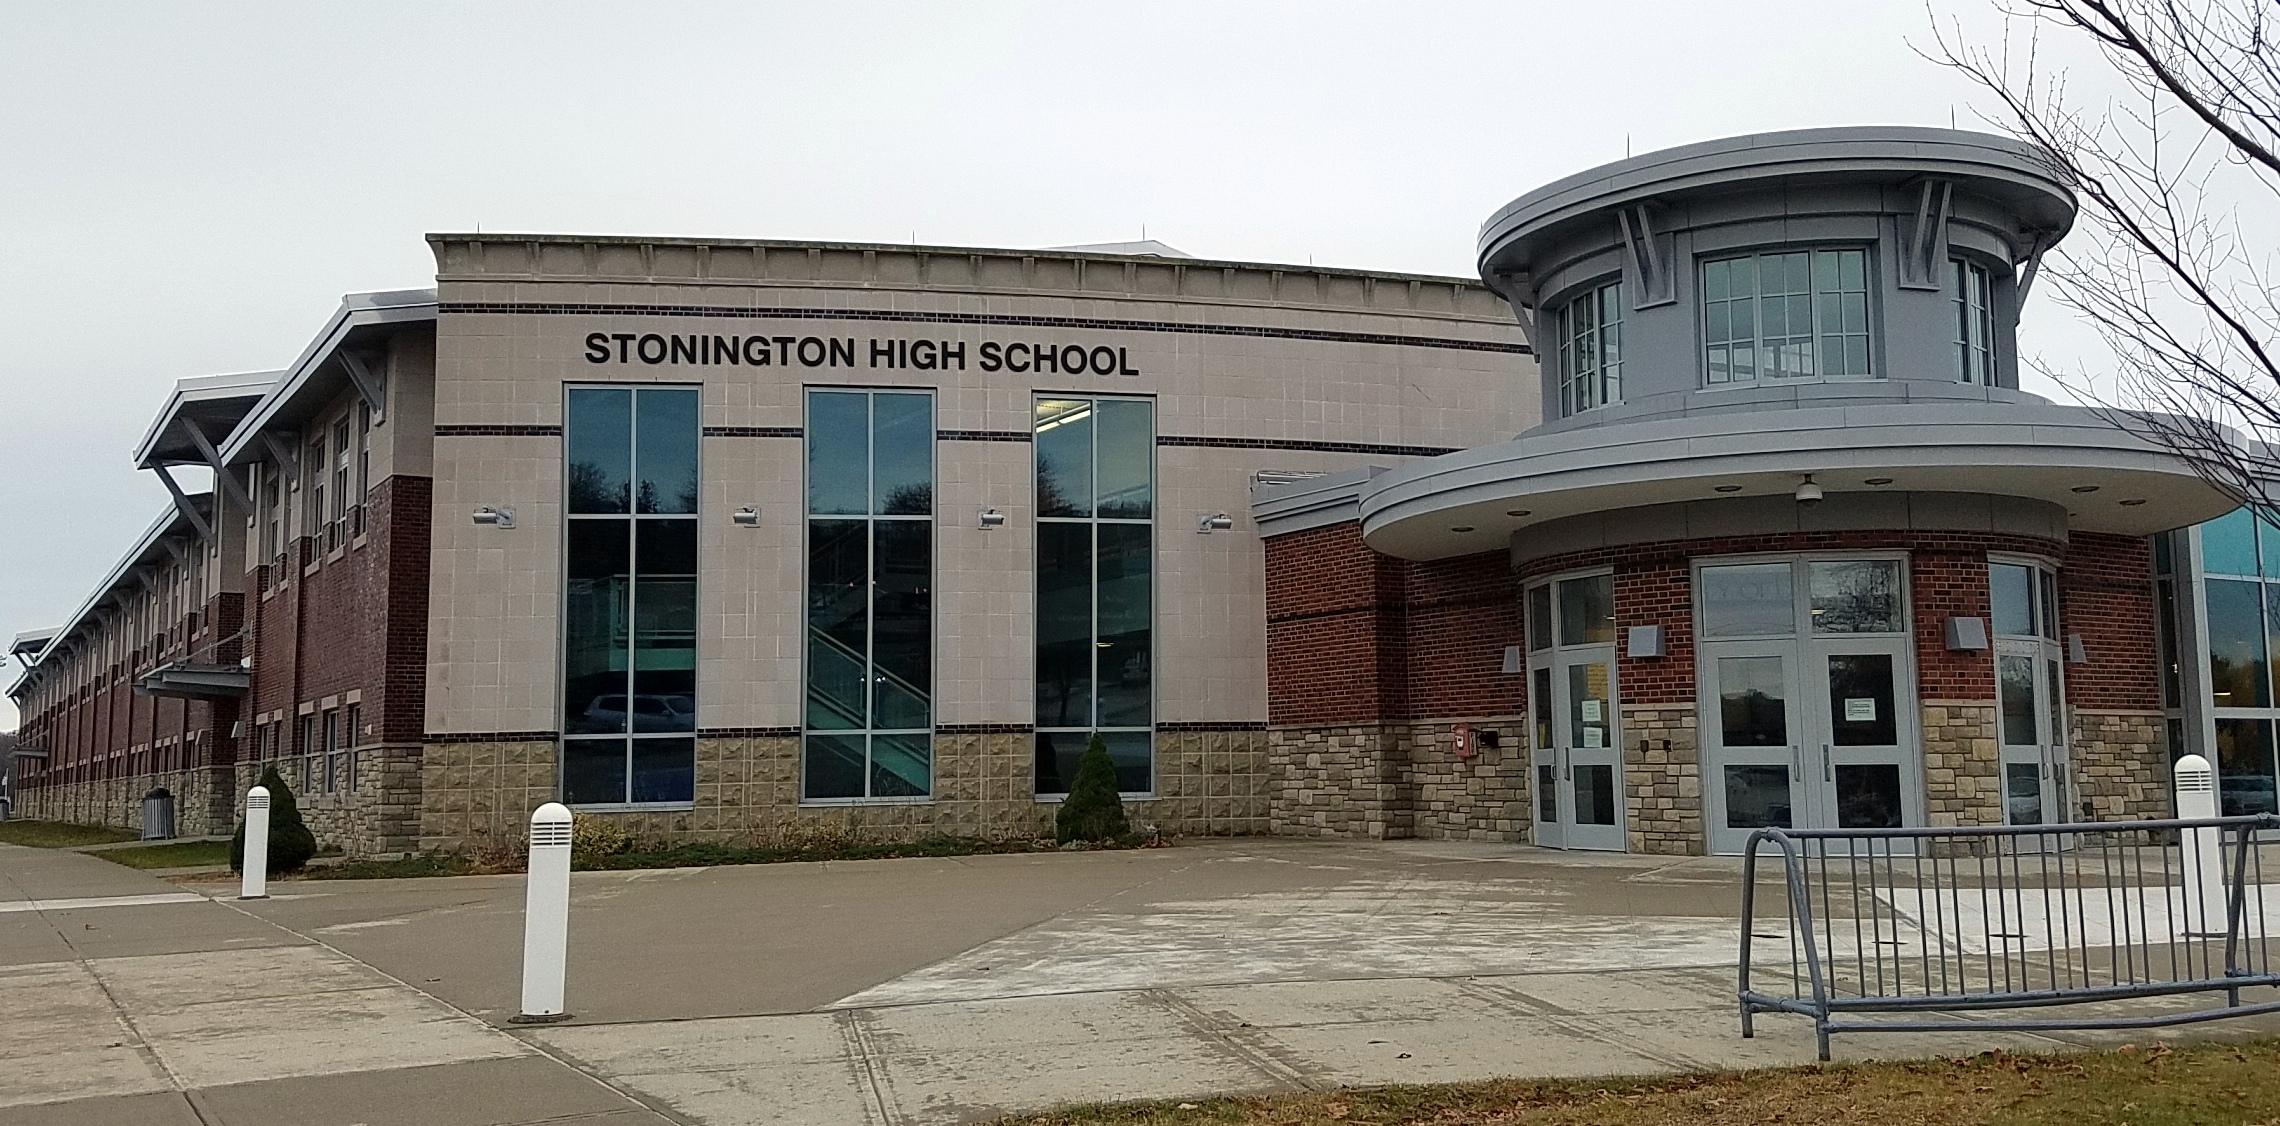 Stonington (Conn.) High School, Nov. 29, 2016